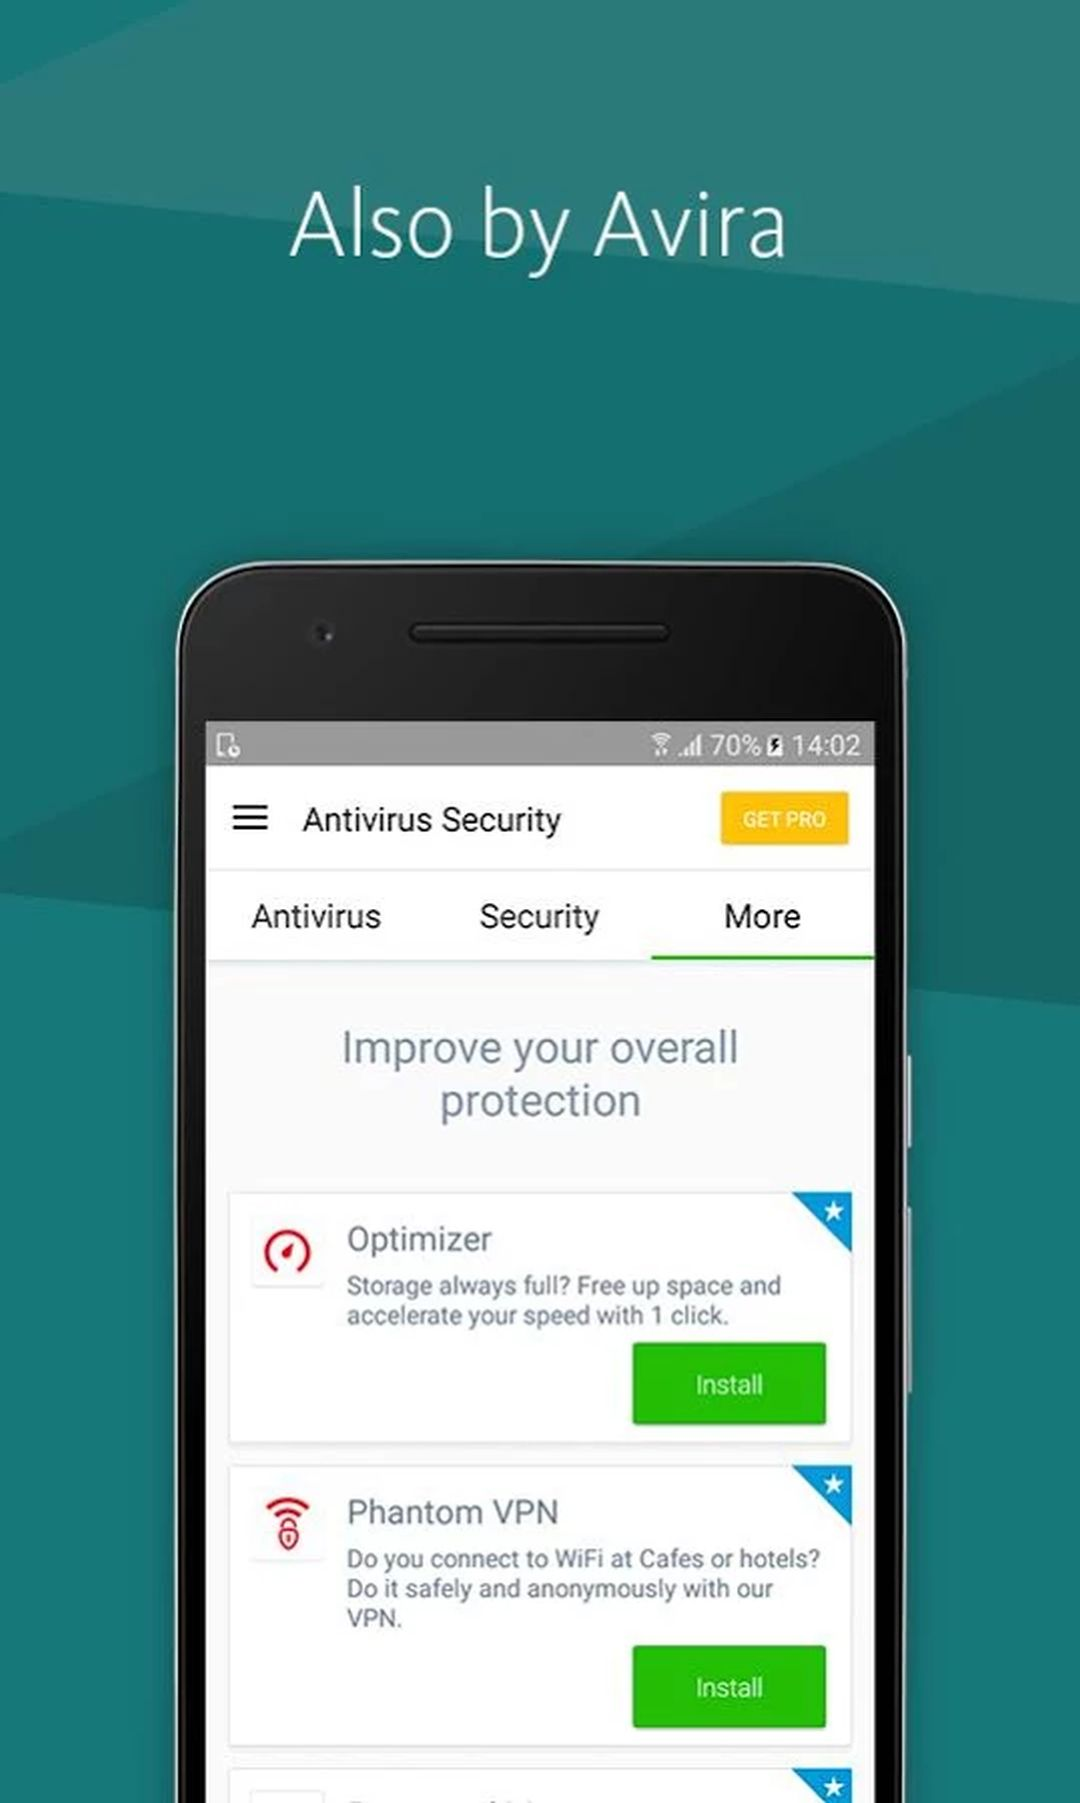 download avira antivirus for android apk